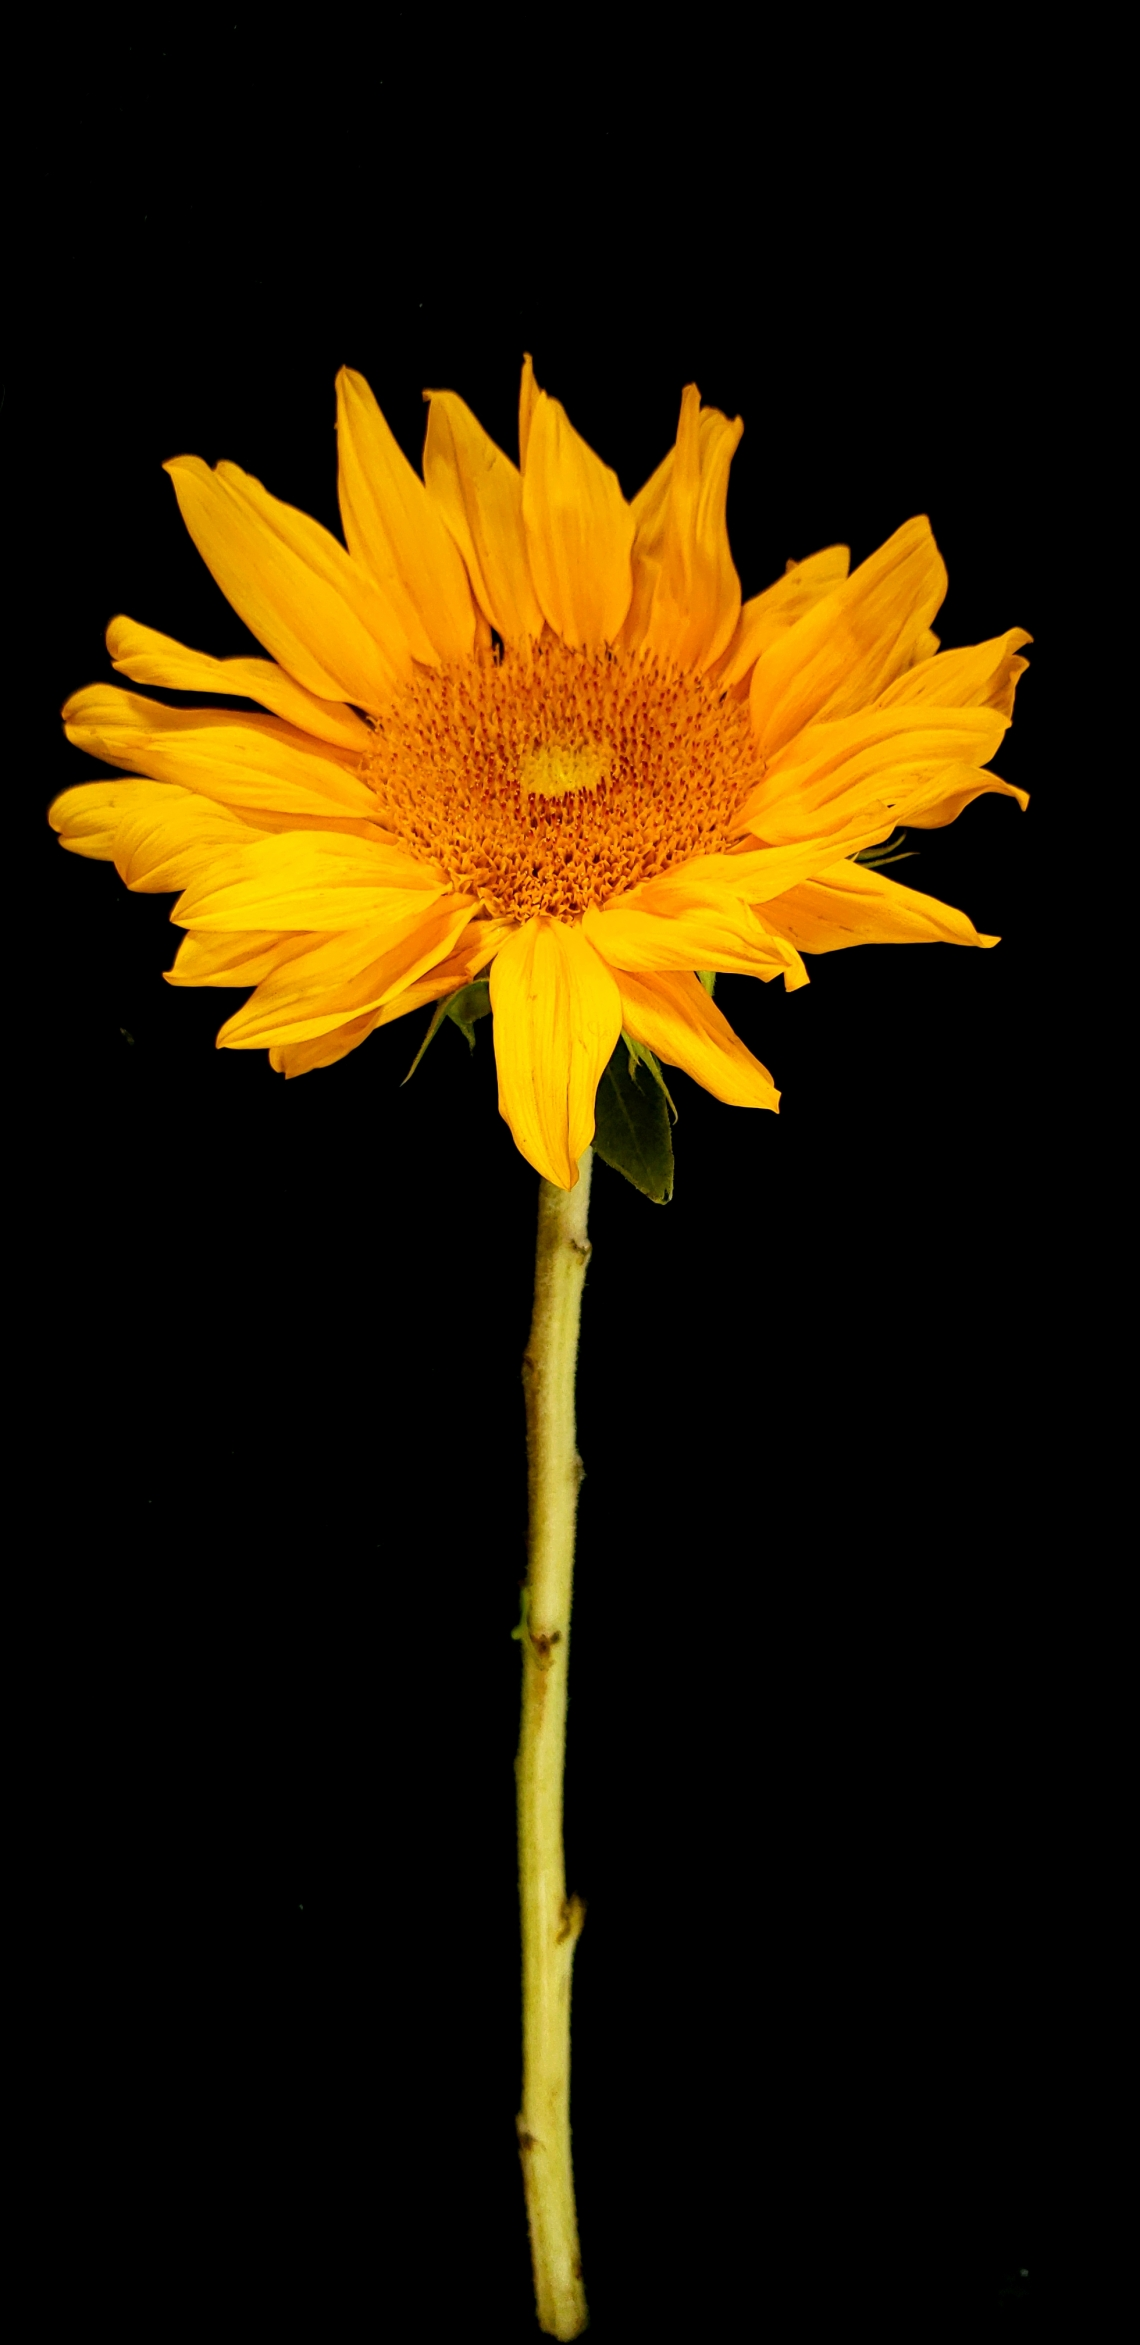 00-sunflower-single-20180510_113656_41978746232_A